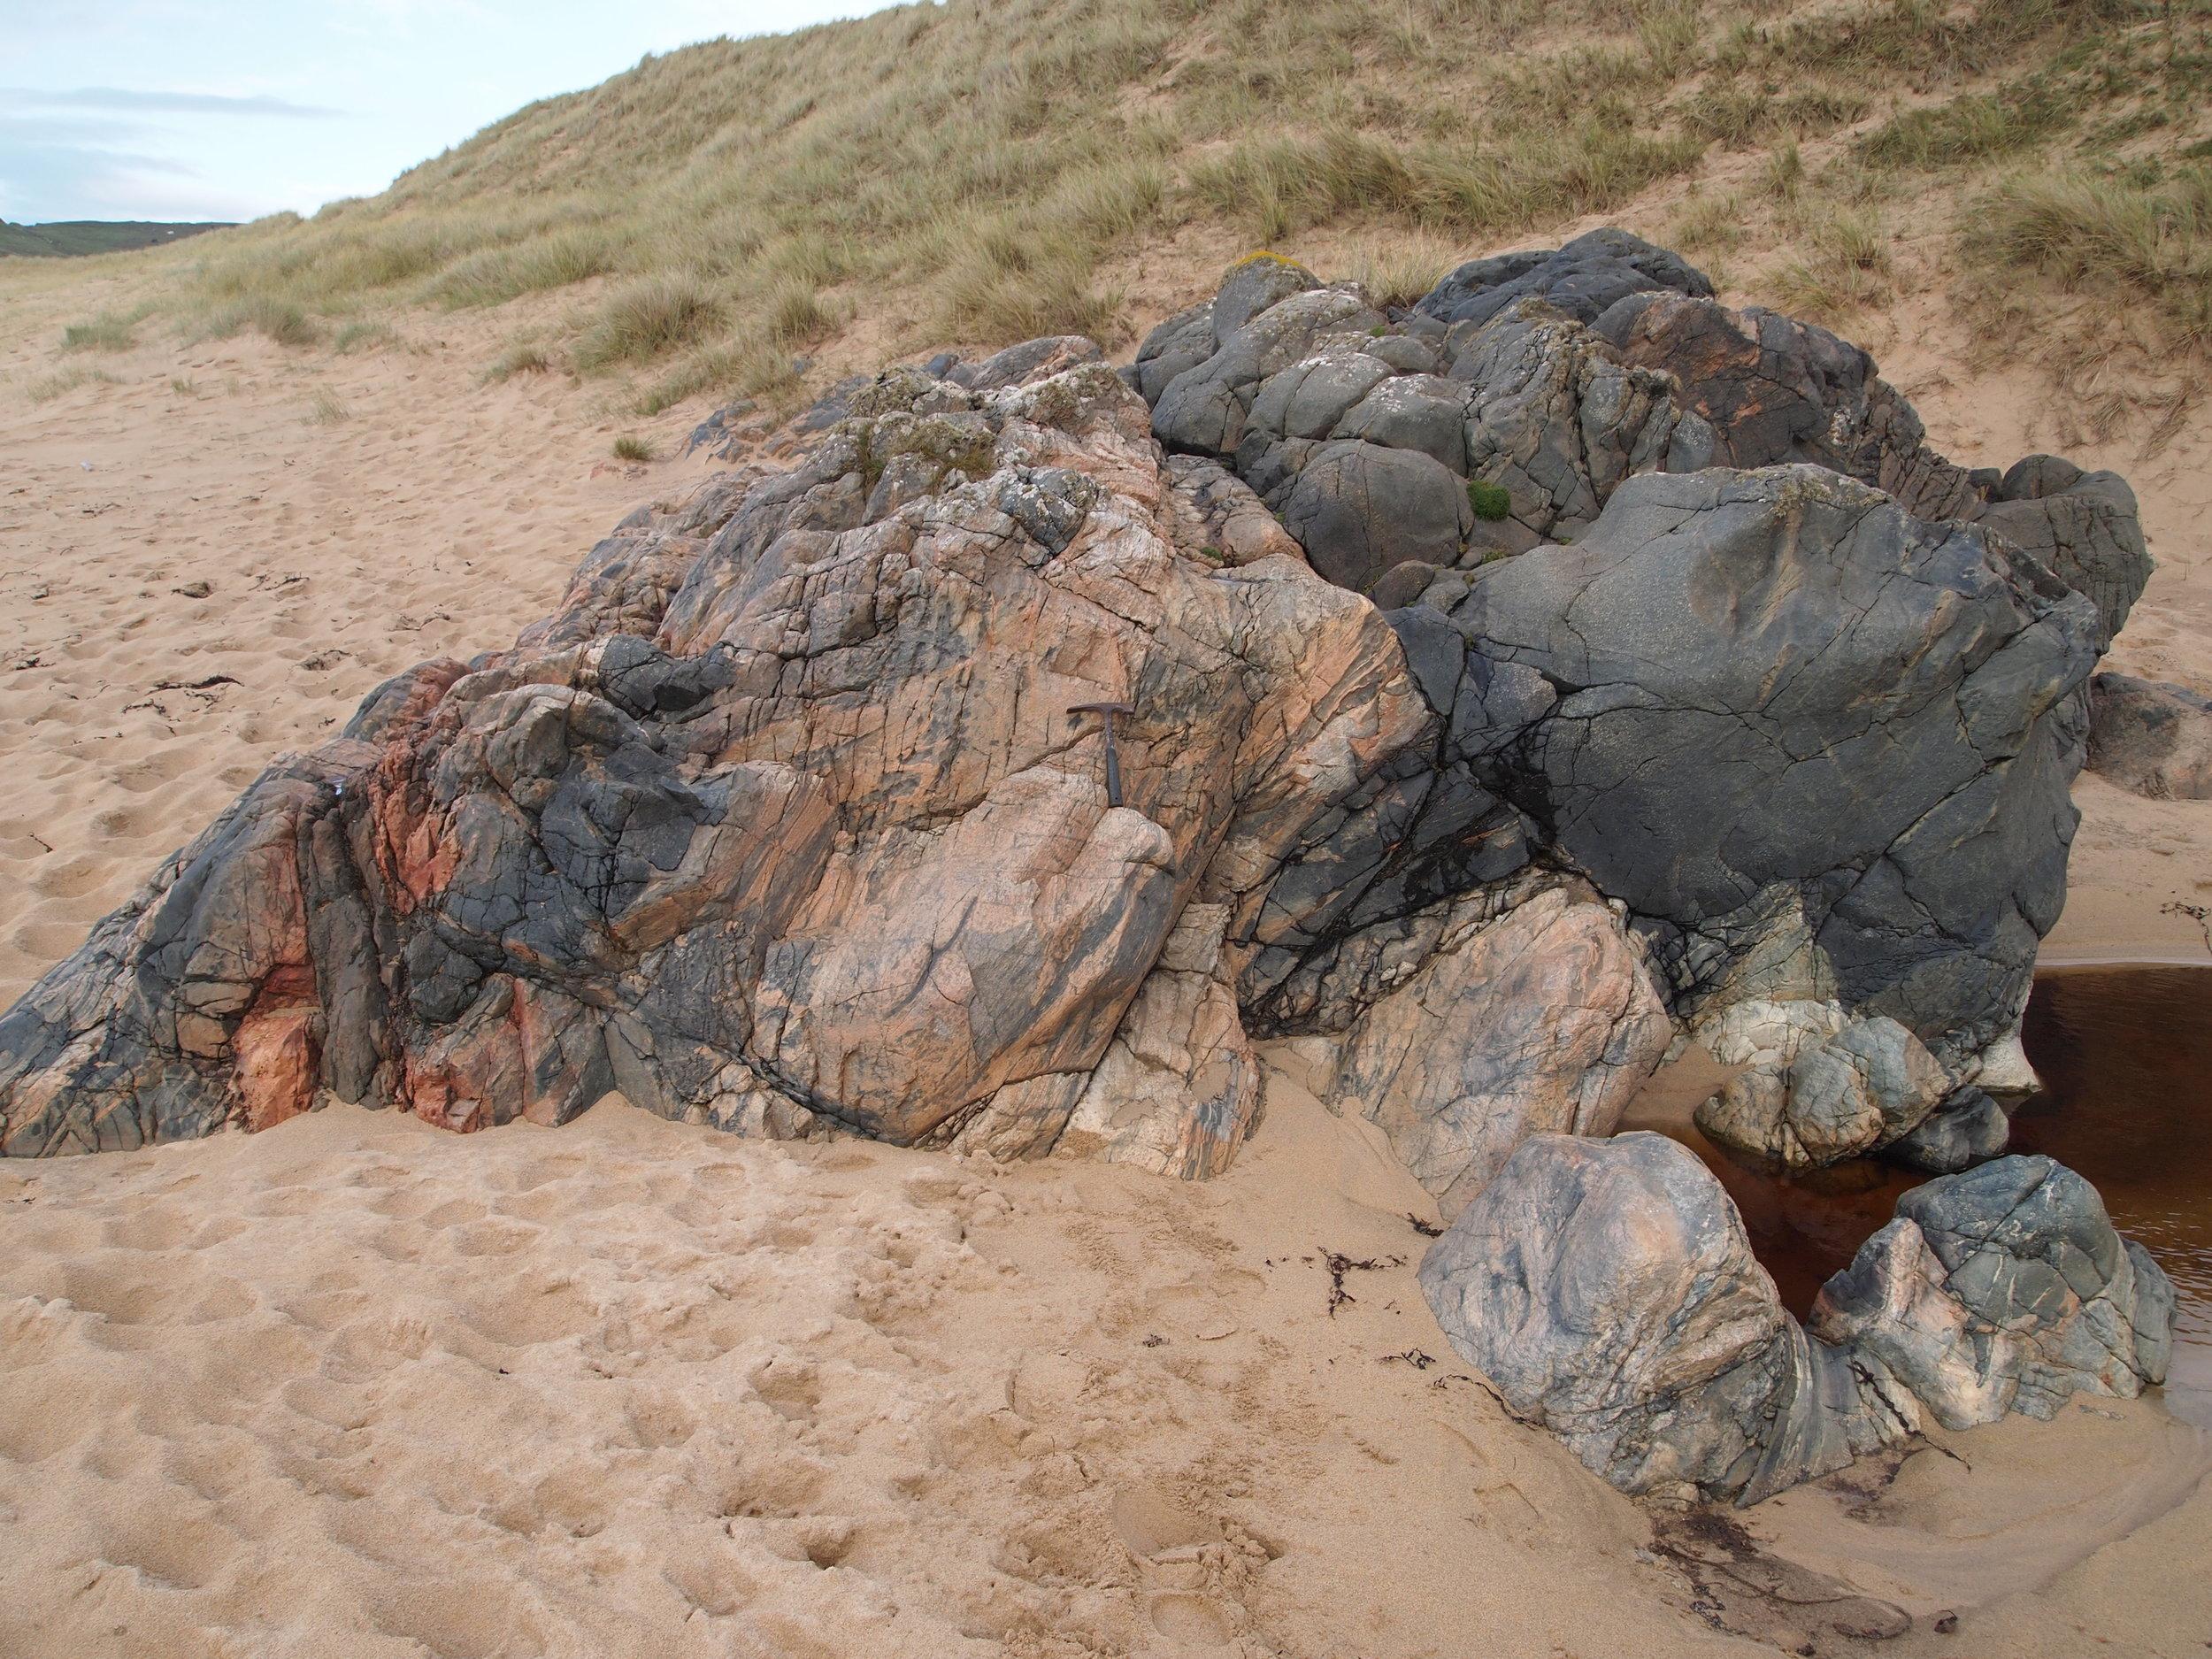 Rhinns Complex gneiss at Lossit Bay